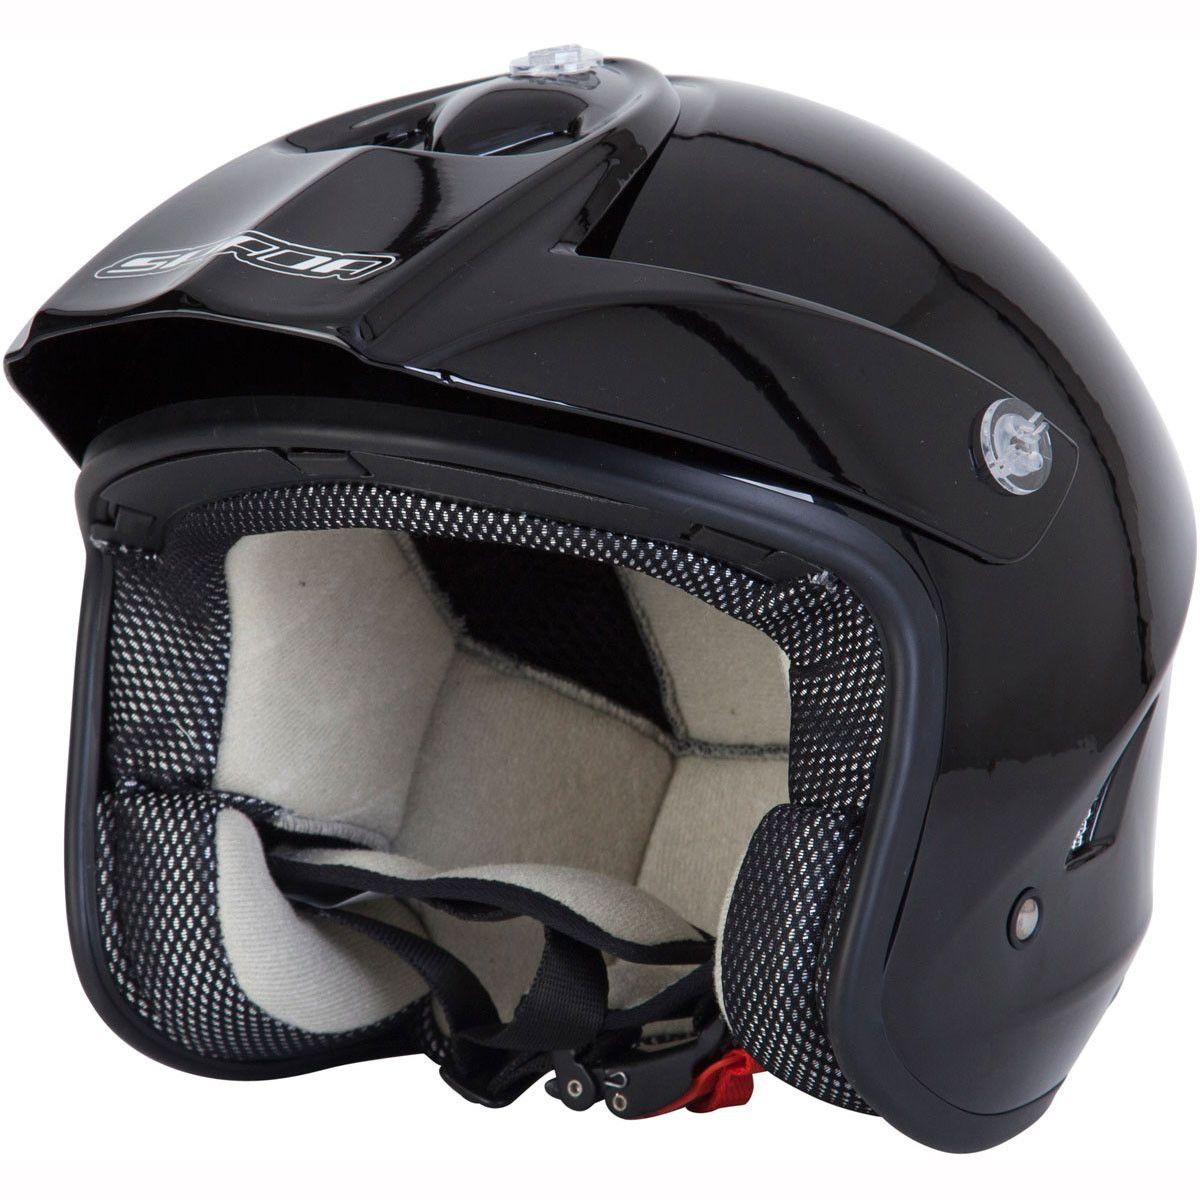 SPADA MATT BLACK OPEN FACE MOTORCYCLE HELMET NEW